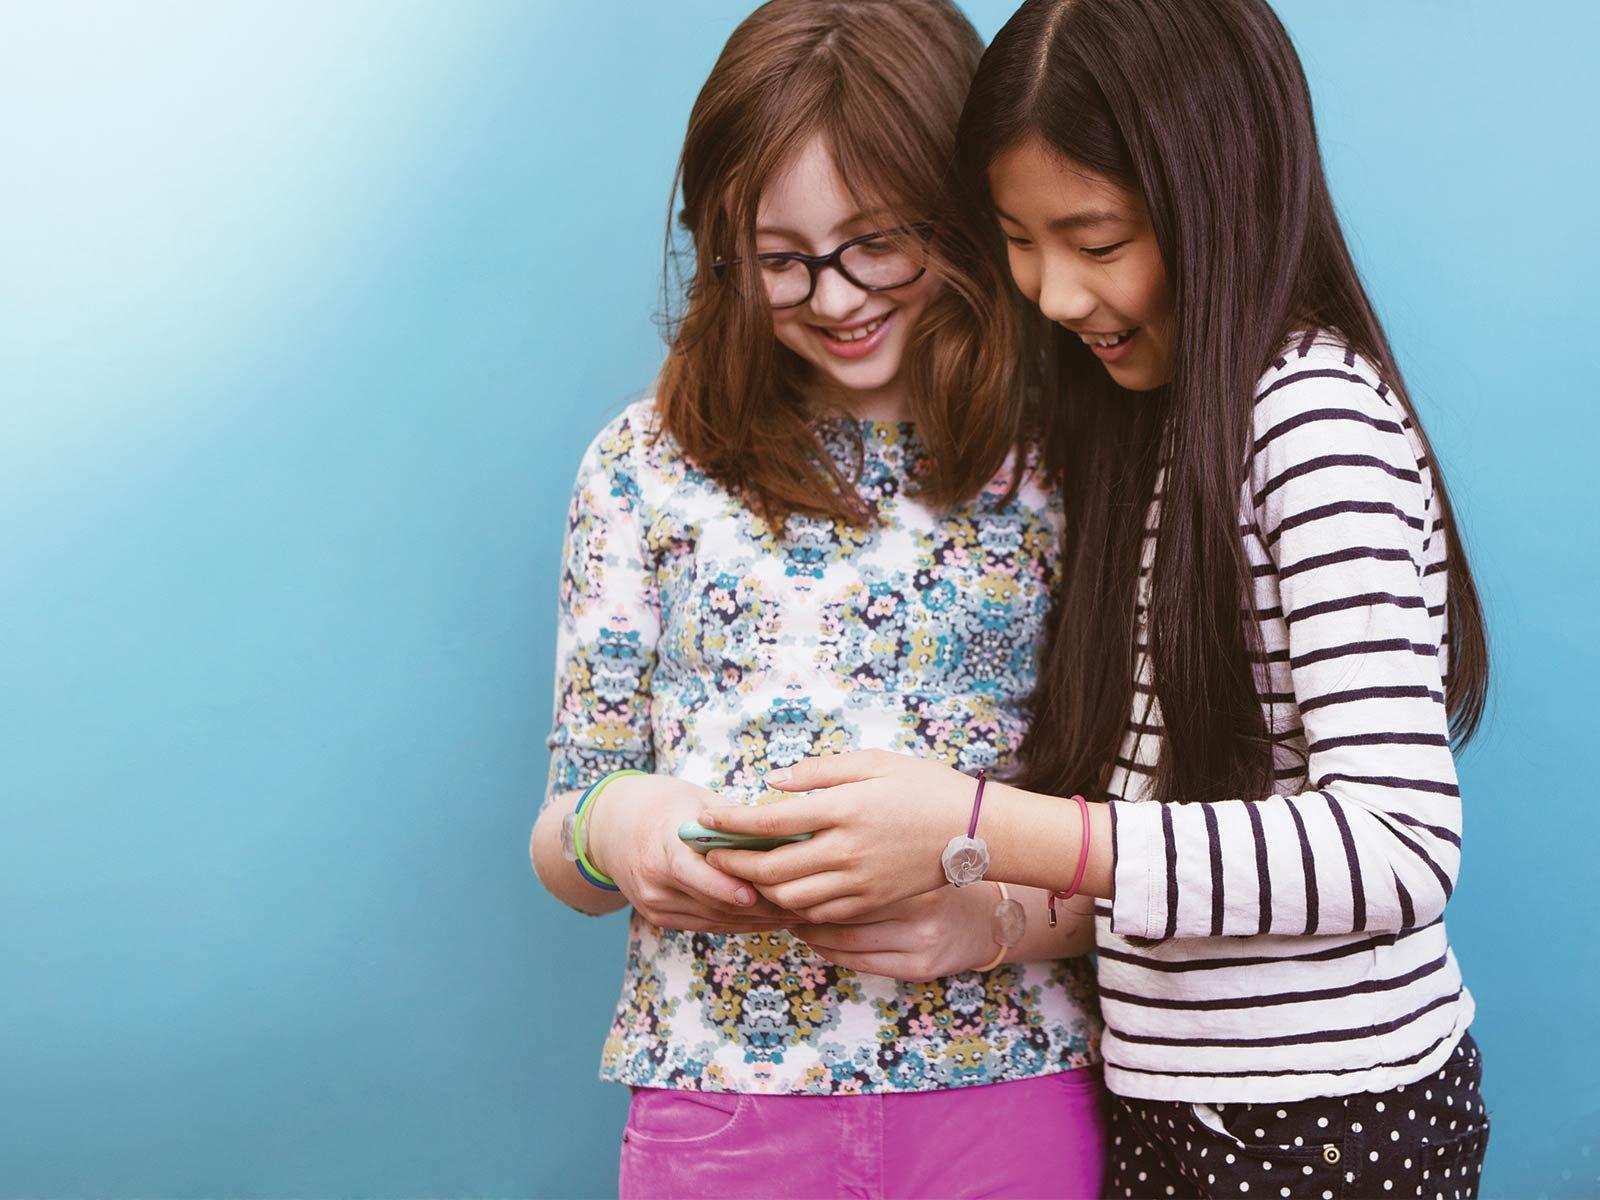 Teaching girls to code with a bracelet | Virgin